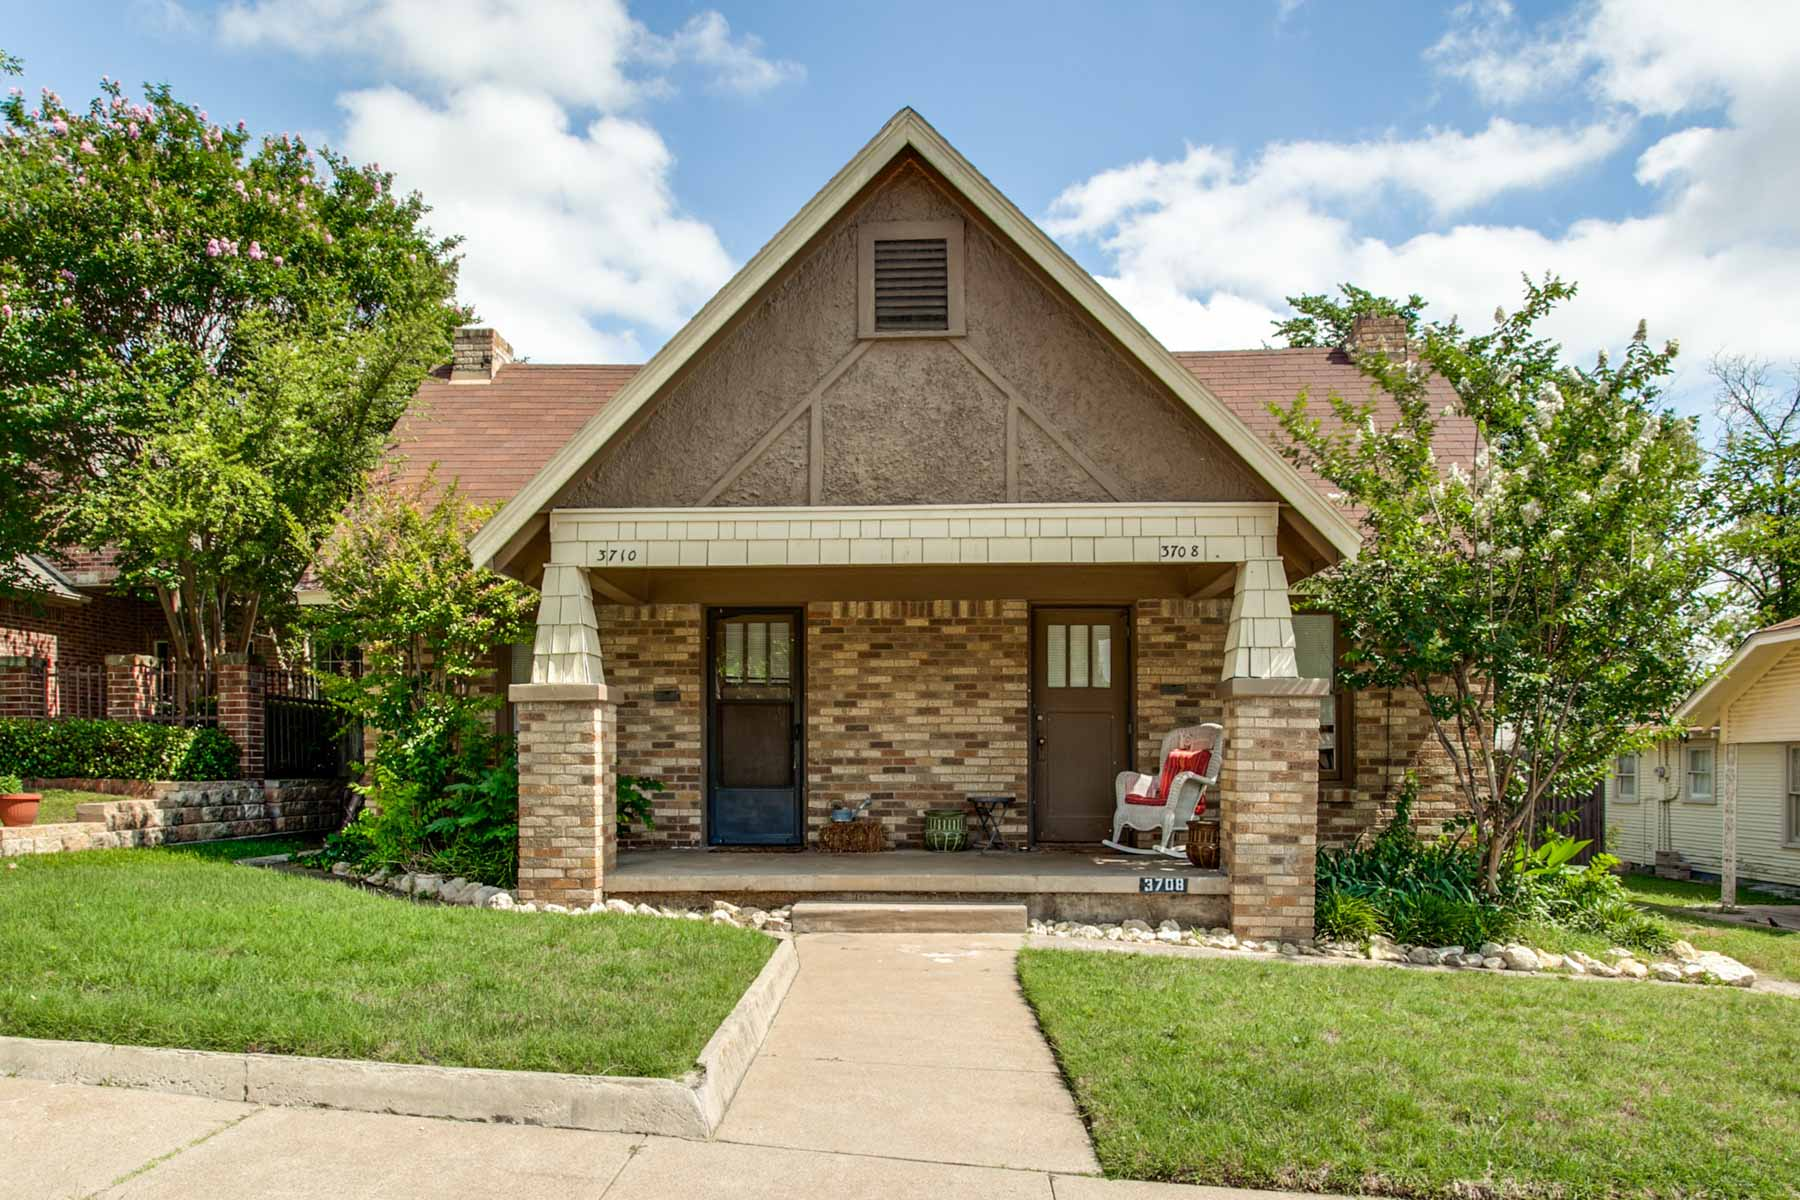 Apartamentos multi-familiares para Venda às Mutli Family Duplex 3710 W. 5th Street Fort Worth, Texas, 76107 Estados Unidos